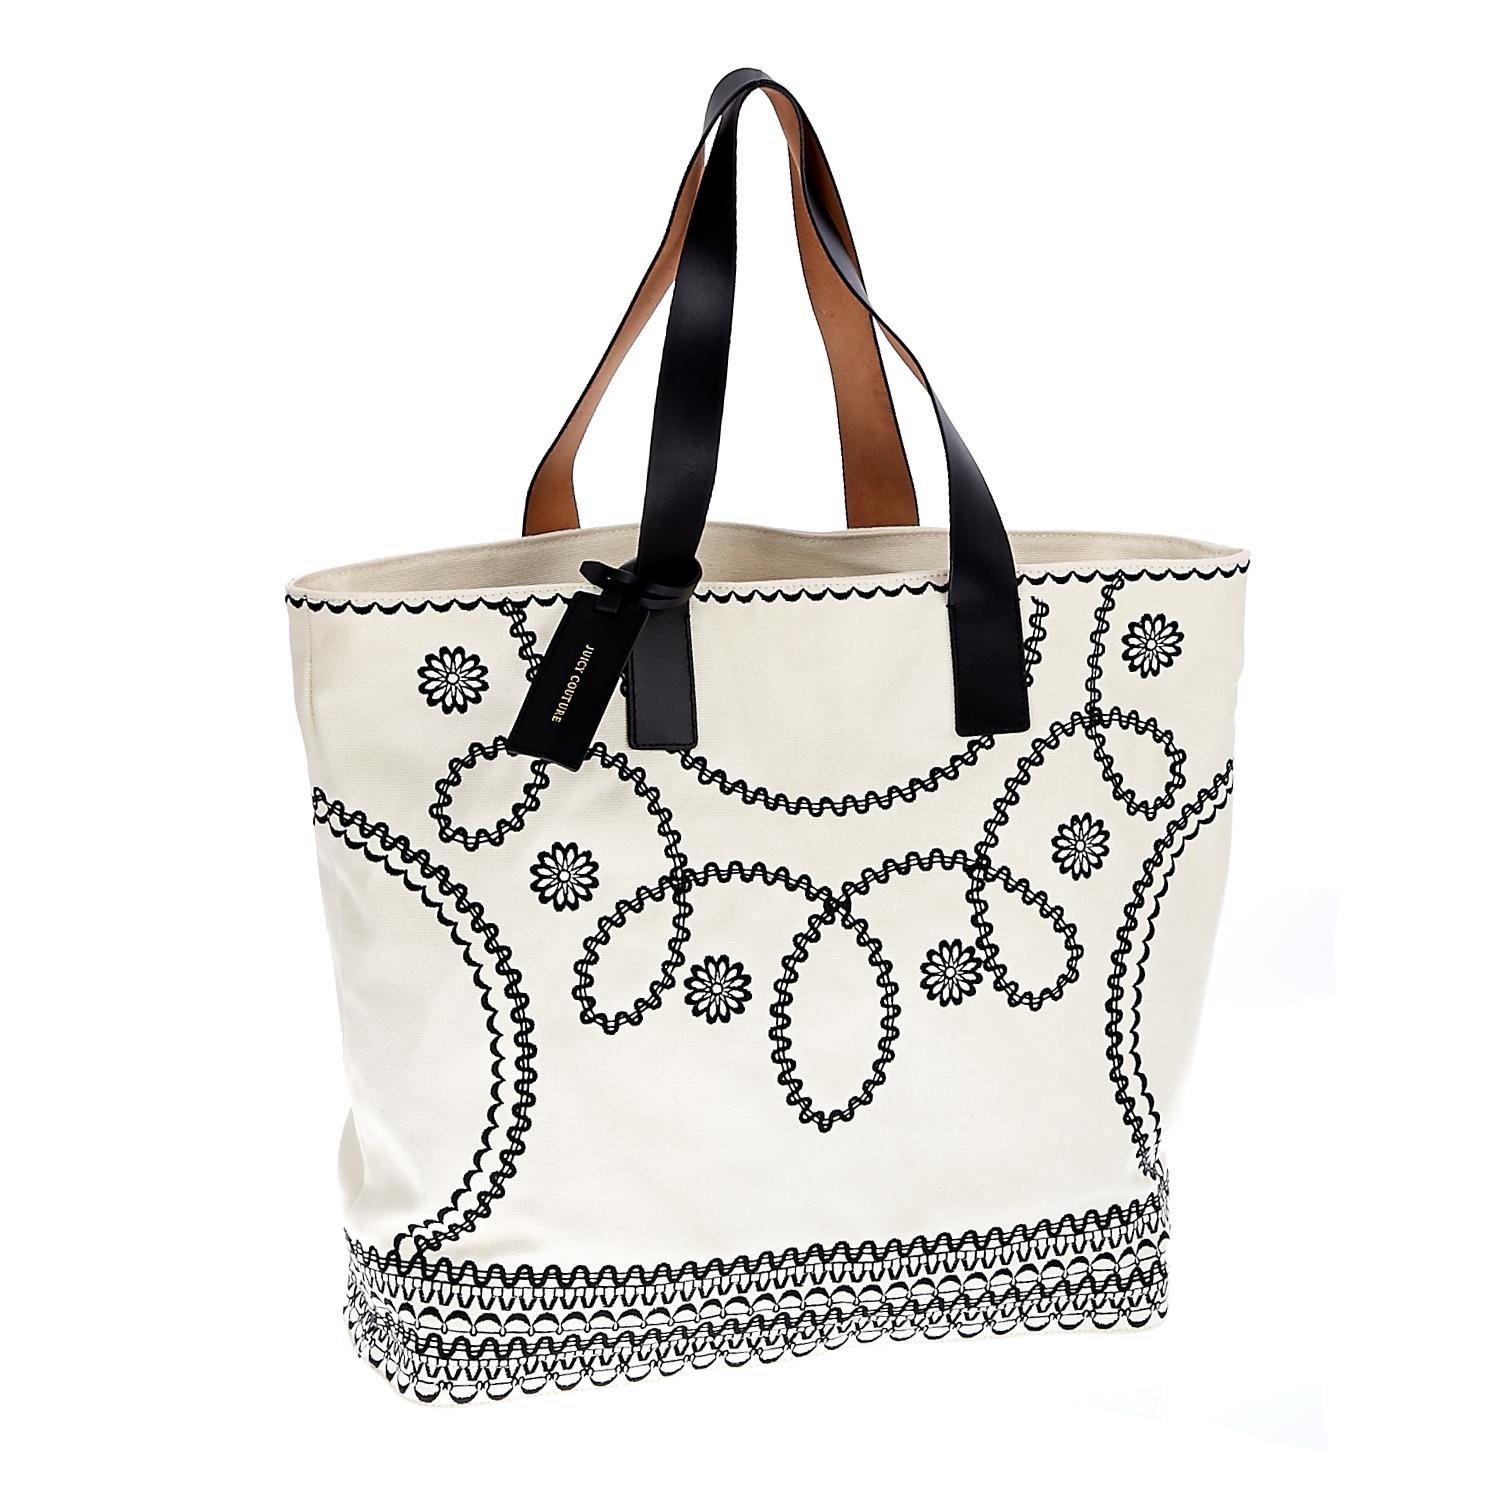 JUICY COUTURE – Γυναικεία τσάντα Juicy Couture μπεζ 1441284.0-0091